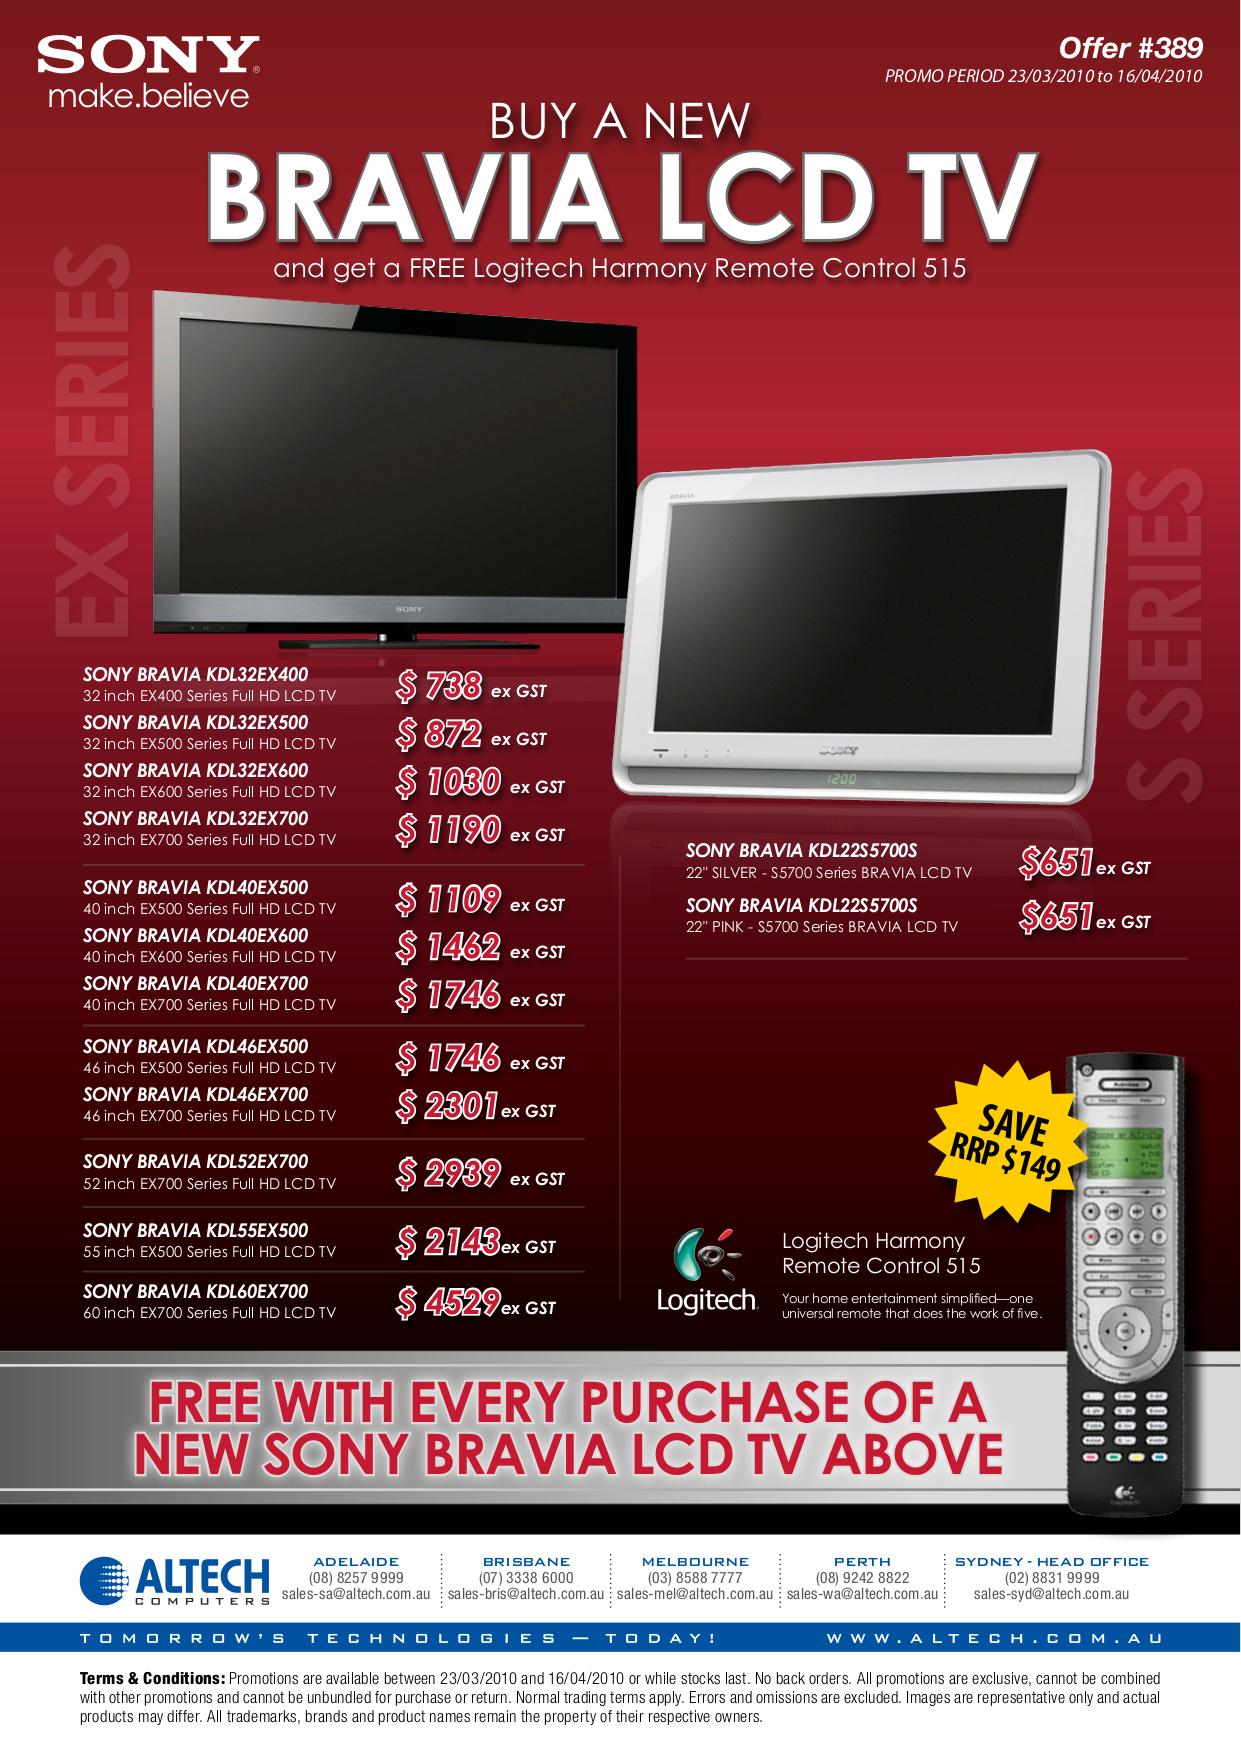 download free pdf for sony bravia kdl 60ex700 tv manual rh umlib com sony kdl60ex700 service manual sony kdl60ex700 service manual